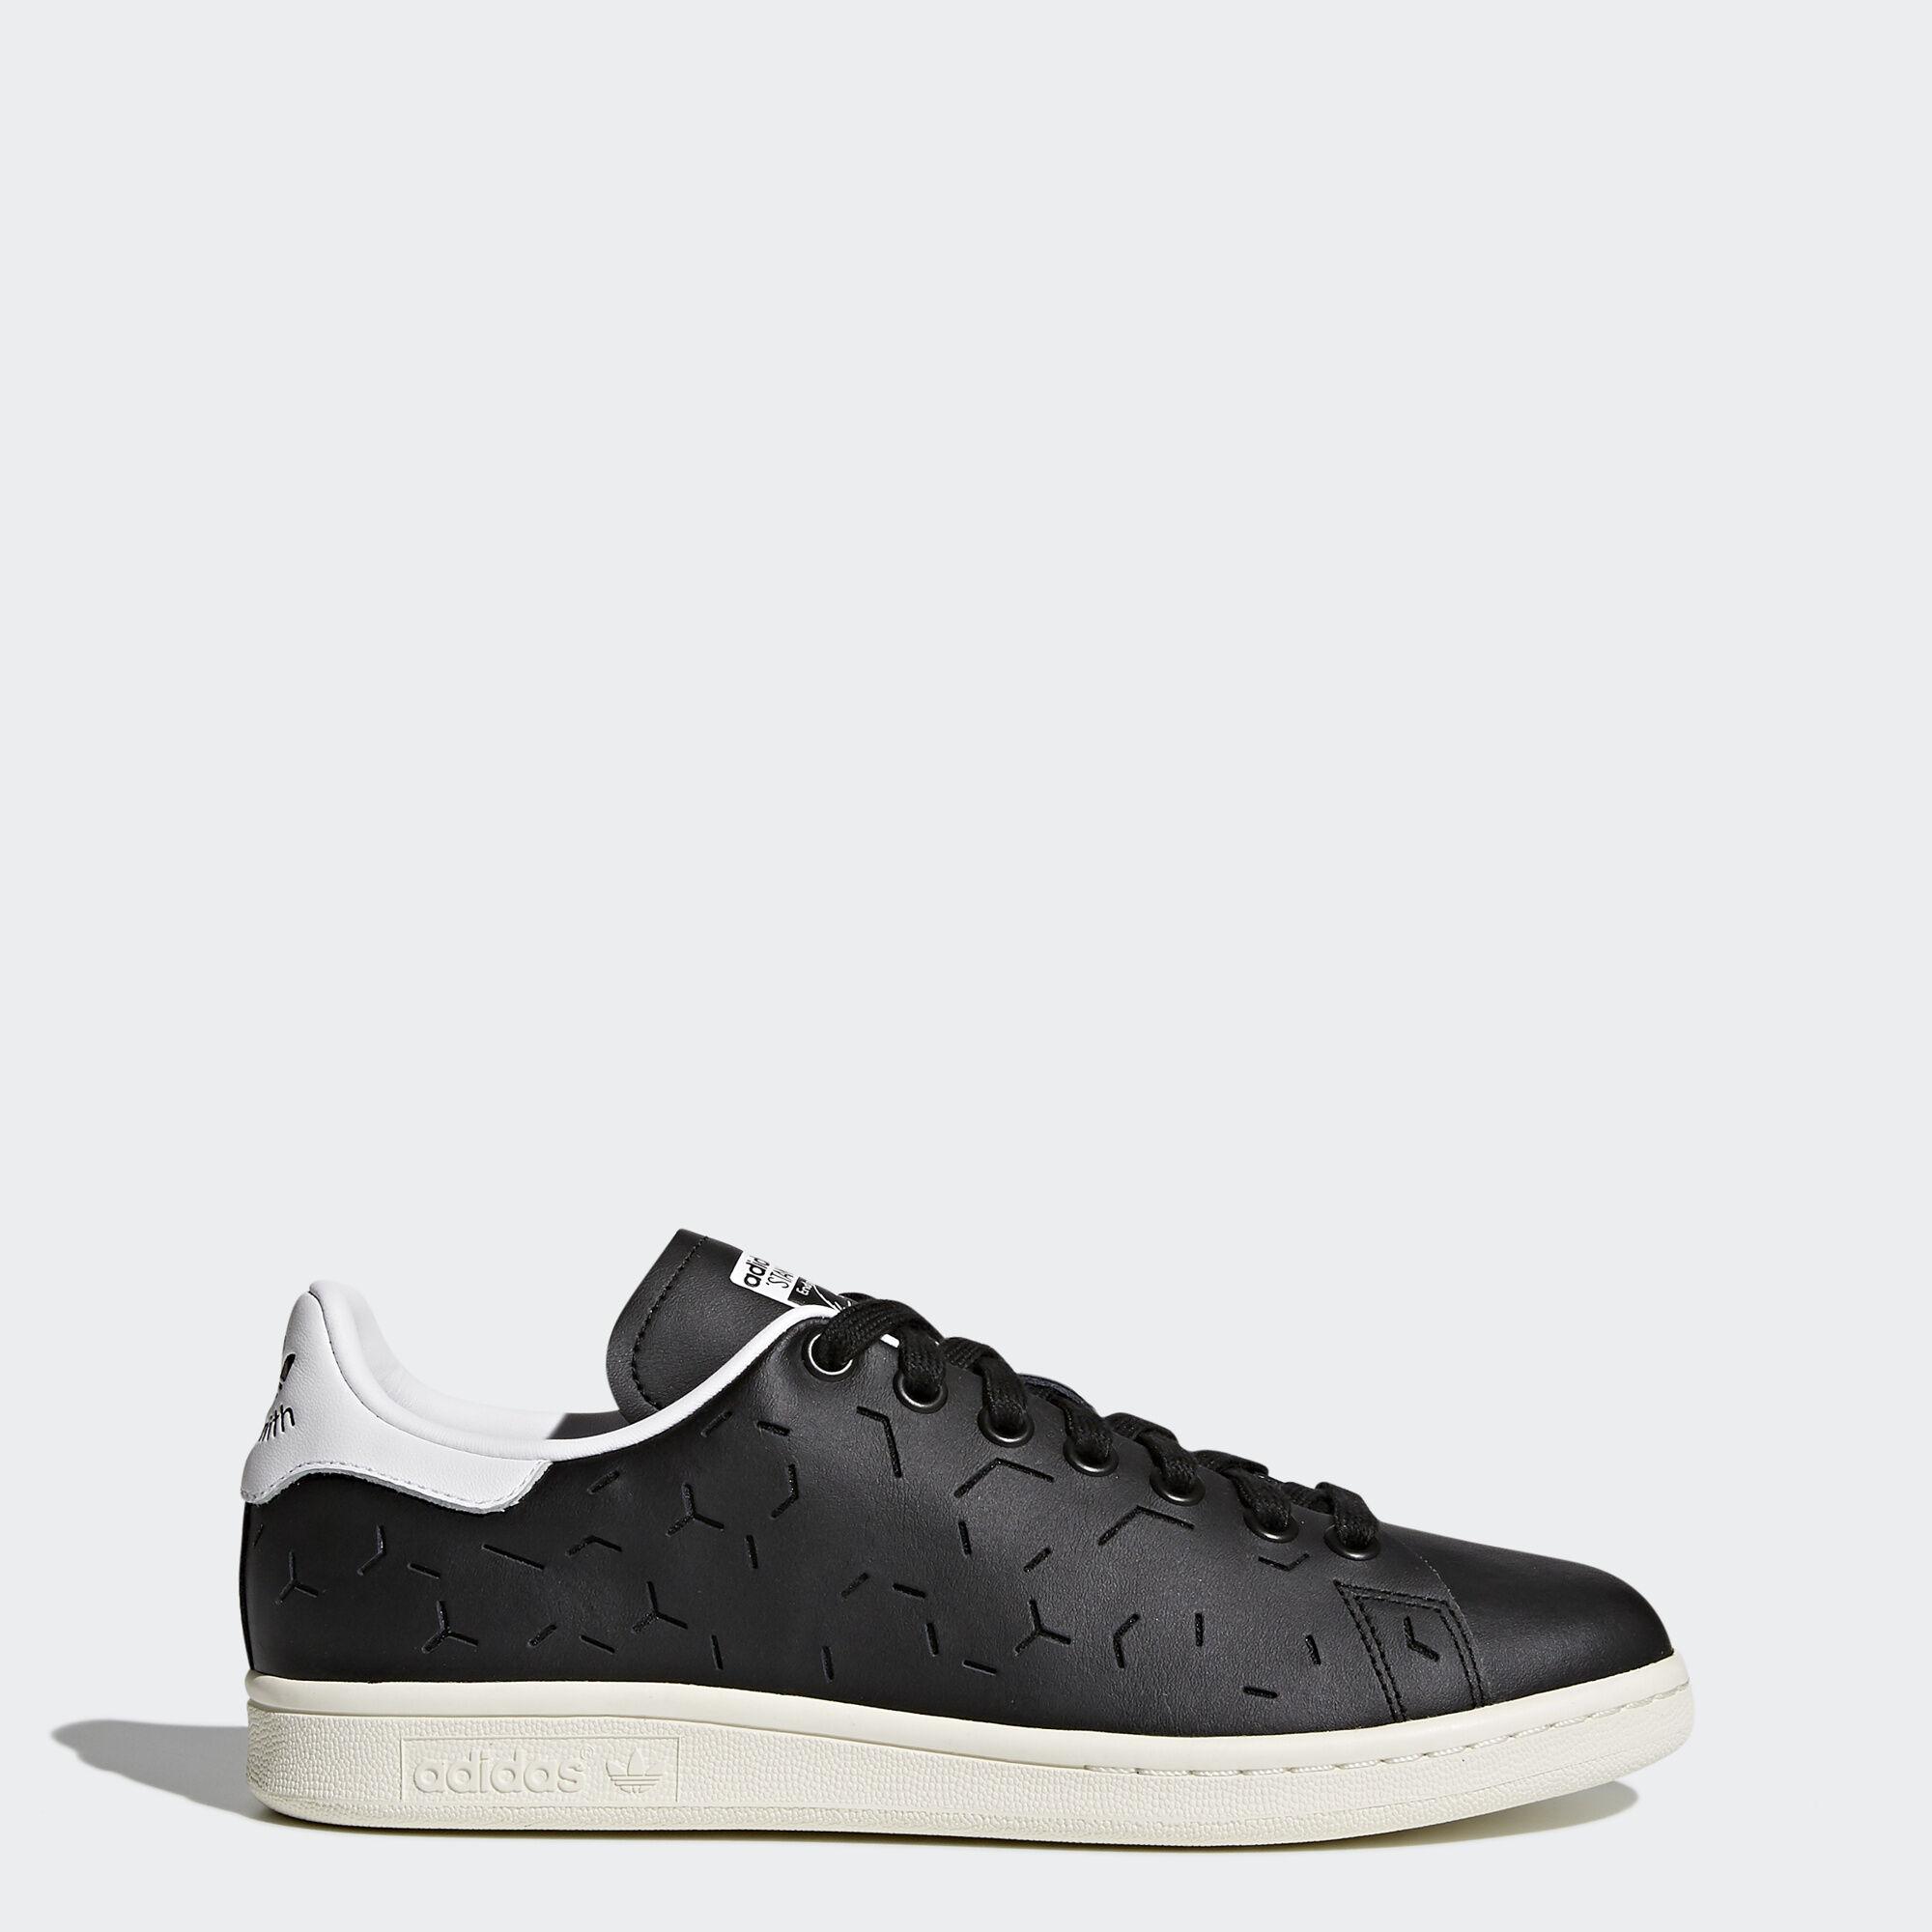 [Adidas] BZ0394 Originals Stan Smith Running Women Shoes Sneakers Black